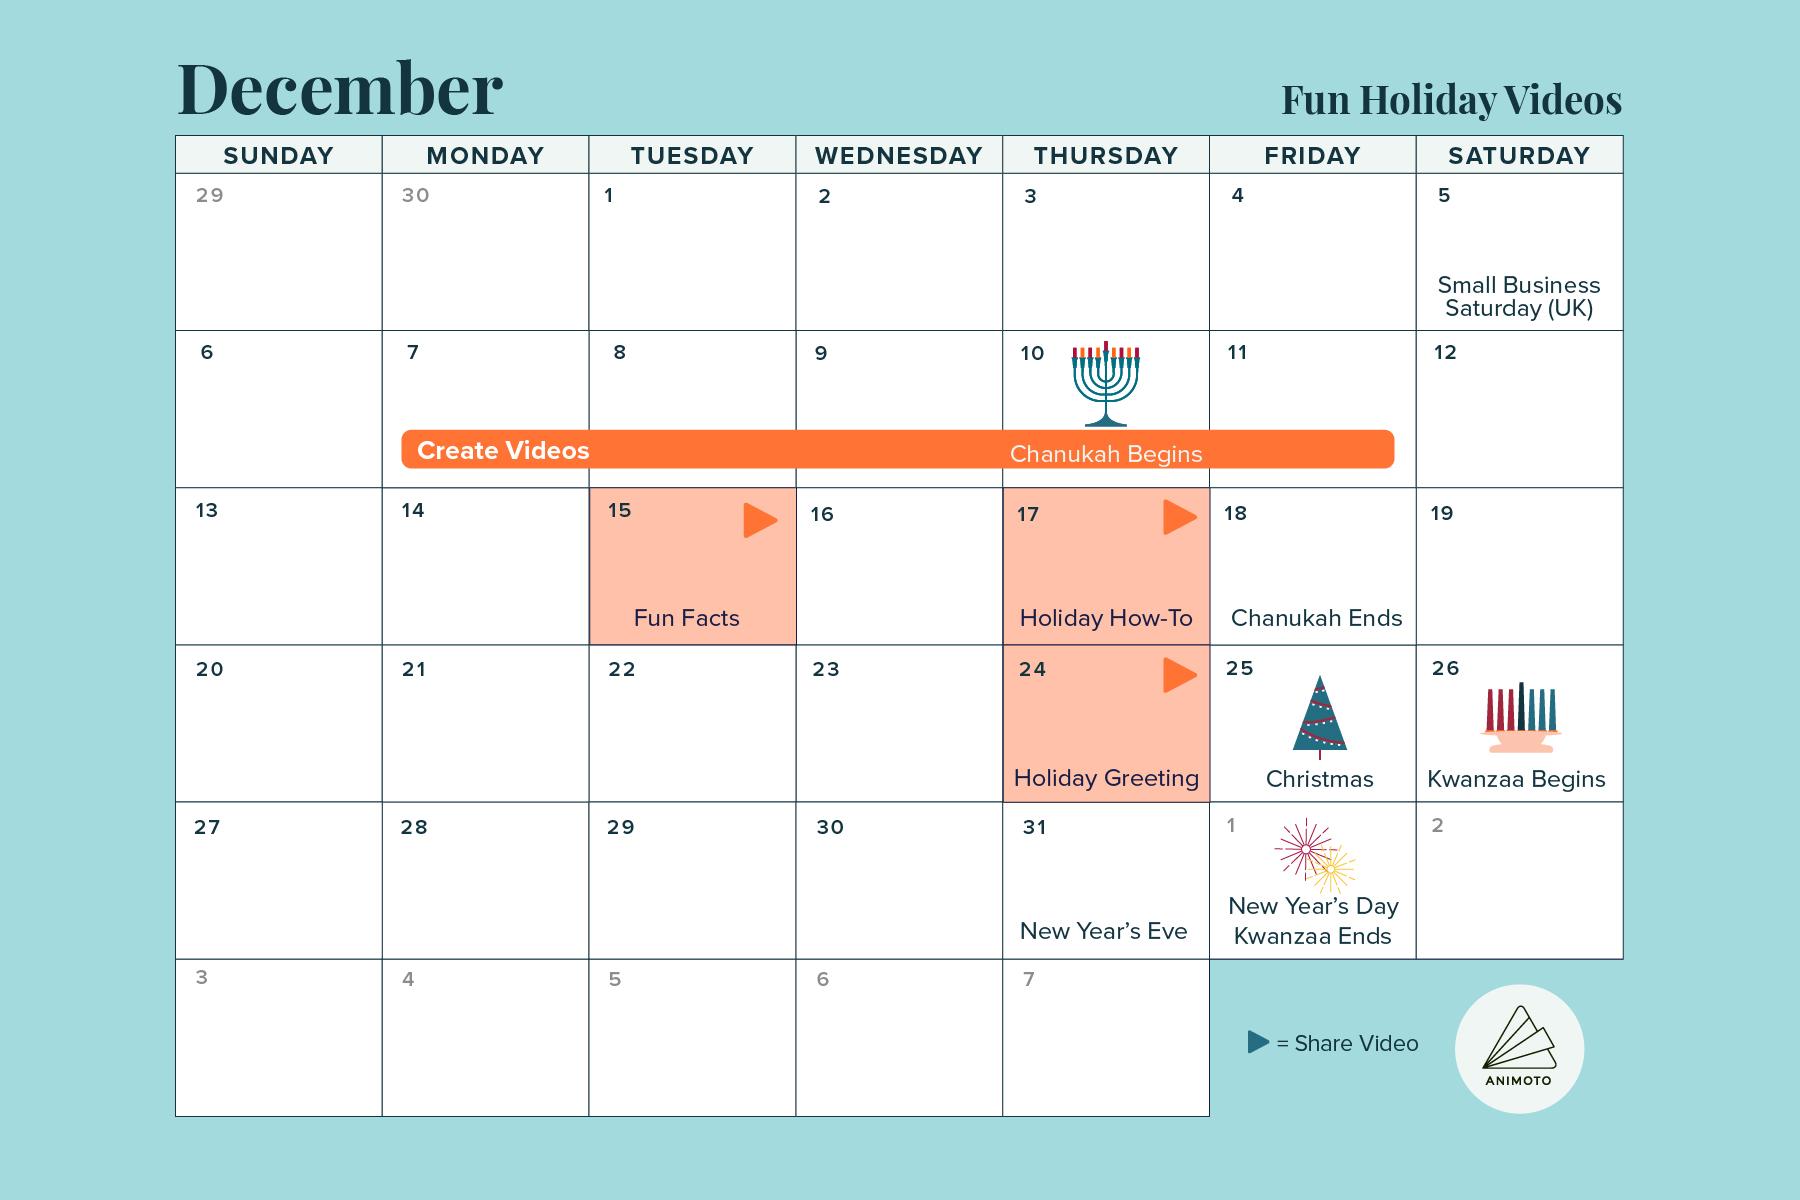 2020-Holiday-Calendar fun-holiday-videos